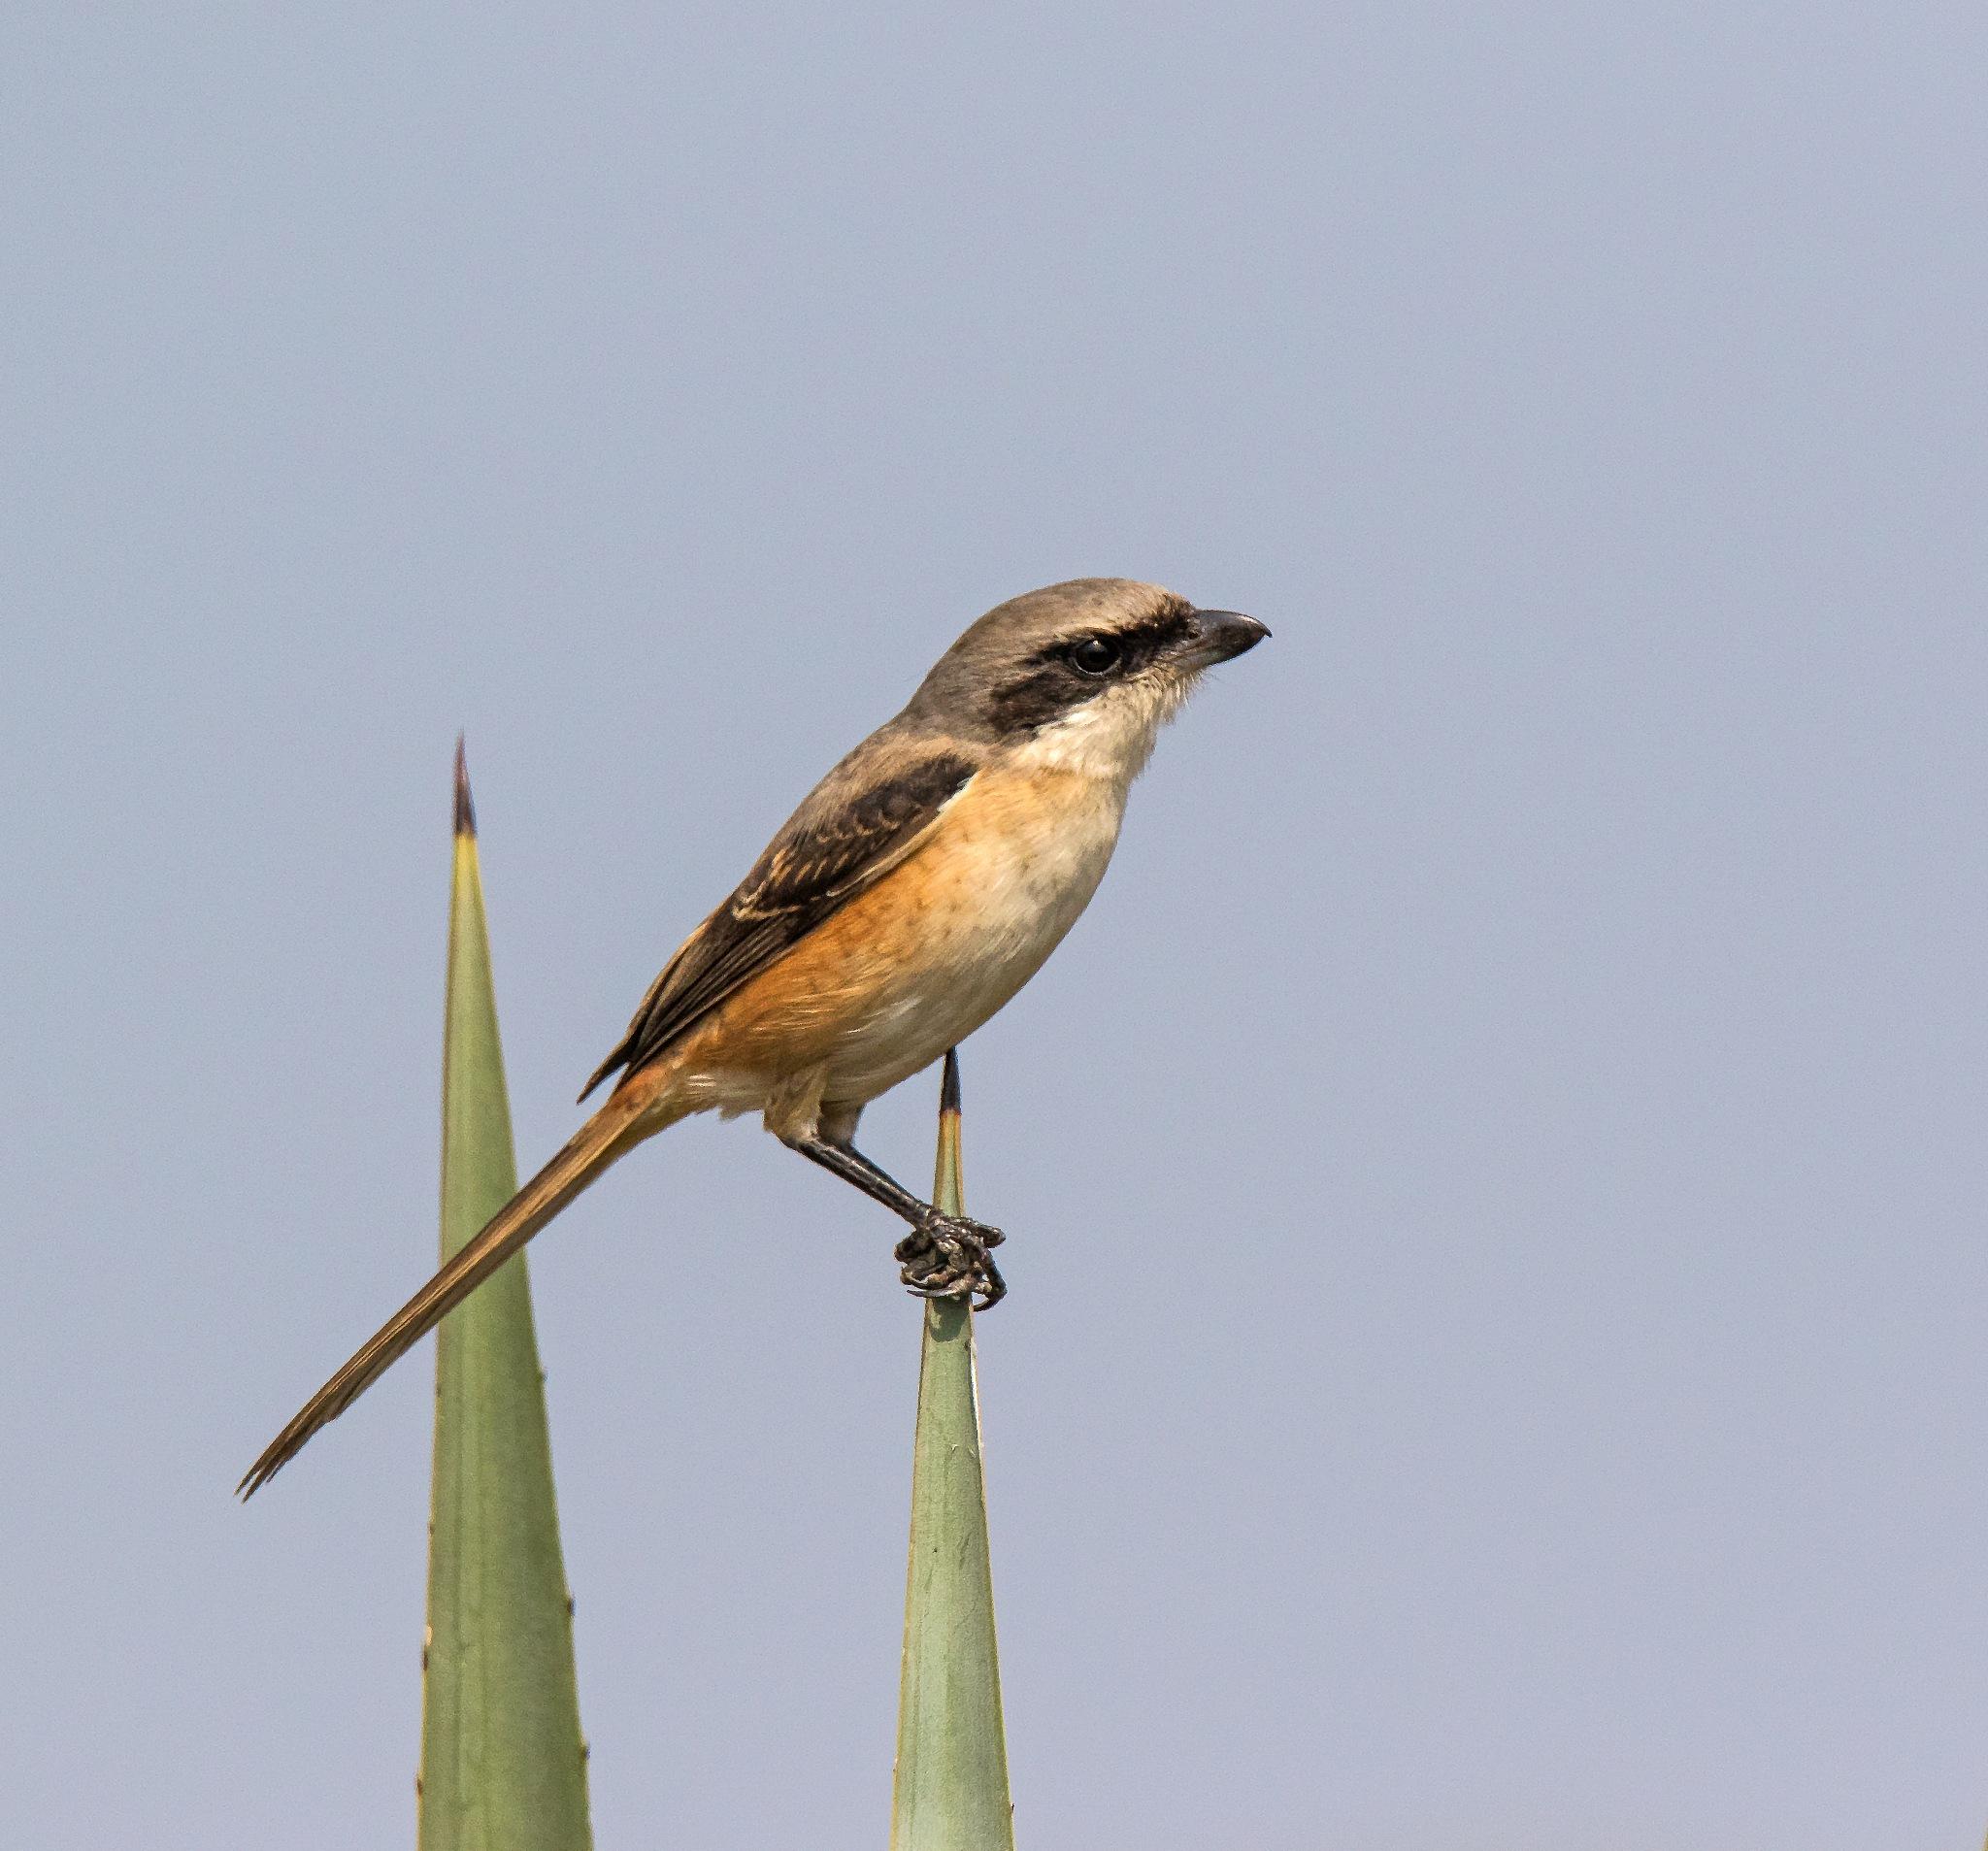 Long-tailed Shrike by DrSudhir Hasamnis